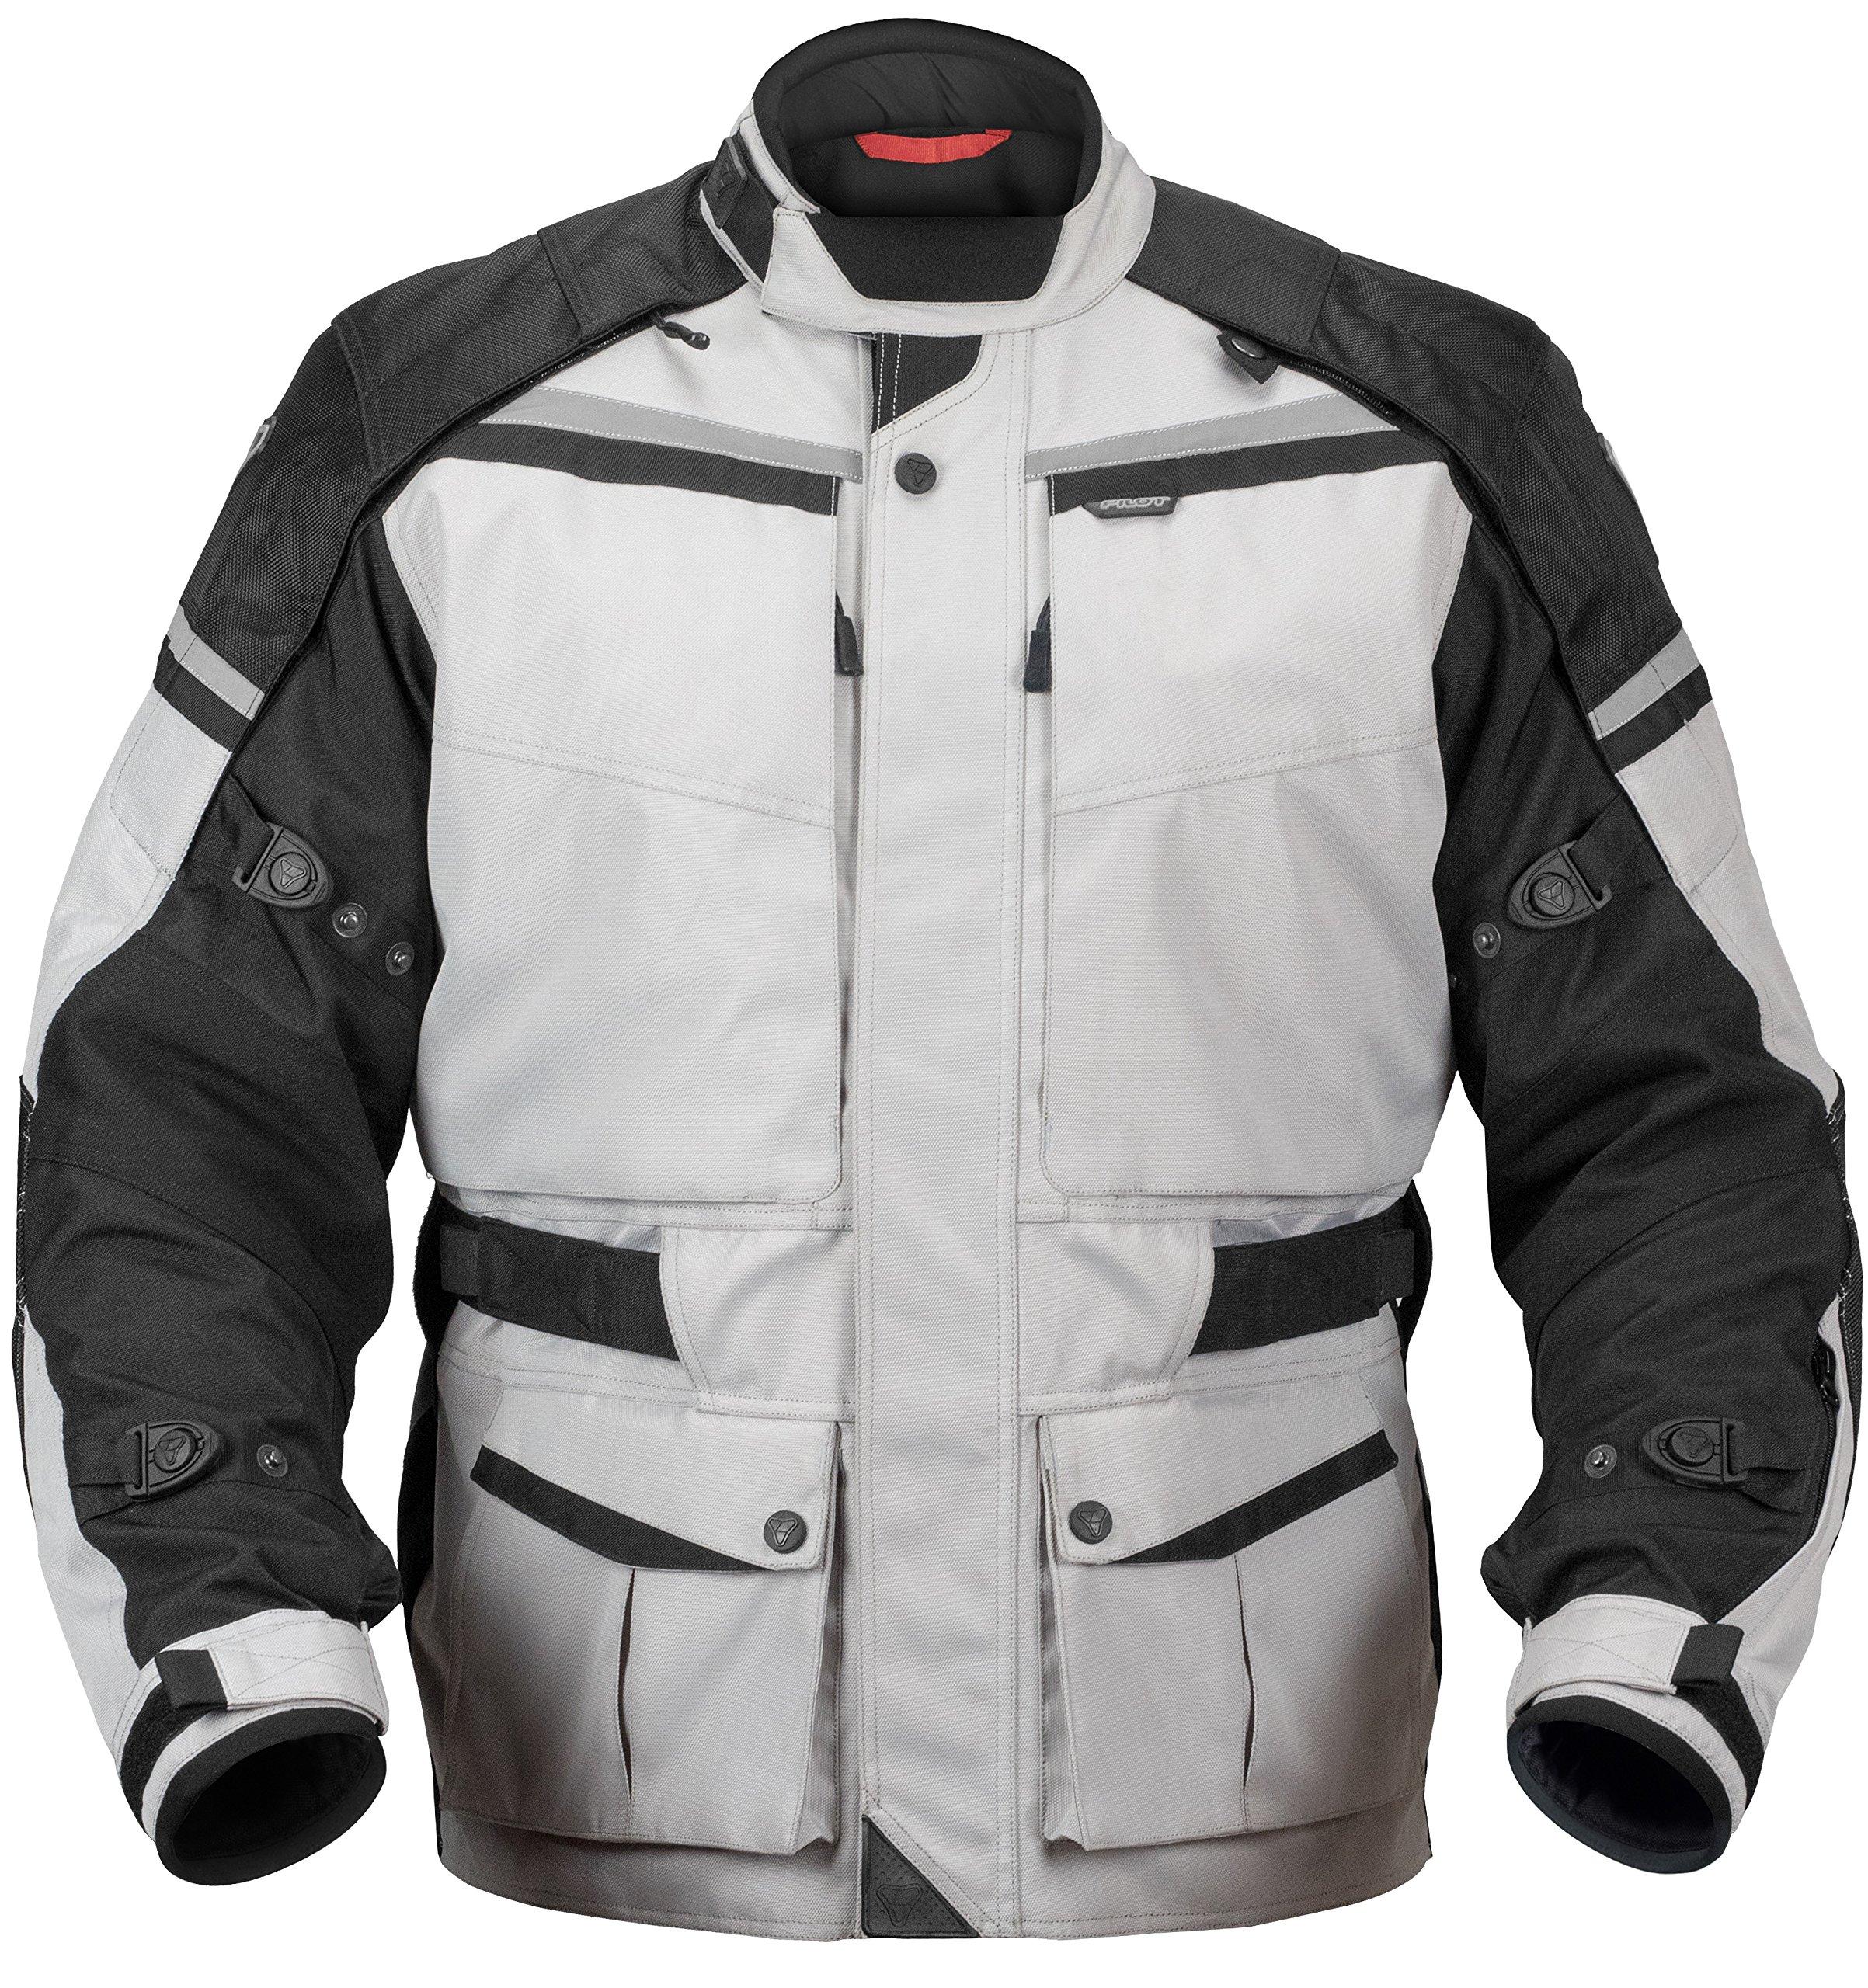 Pilot Motosport Trans.Urban V2 Motorcycle Touring/Adventure Jacket